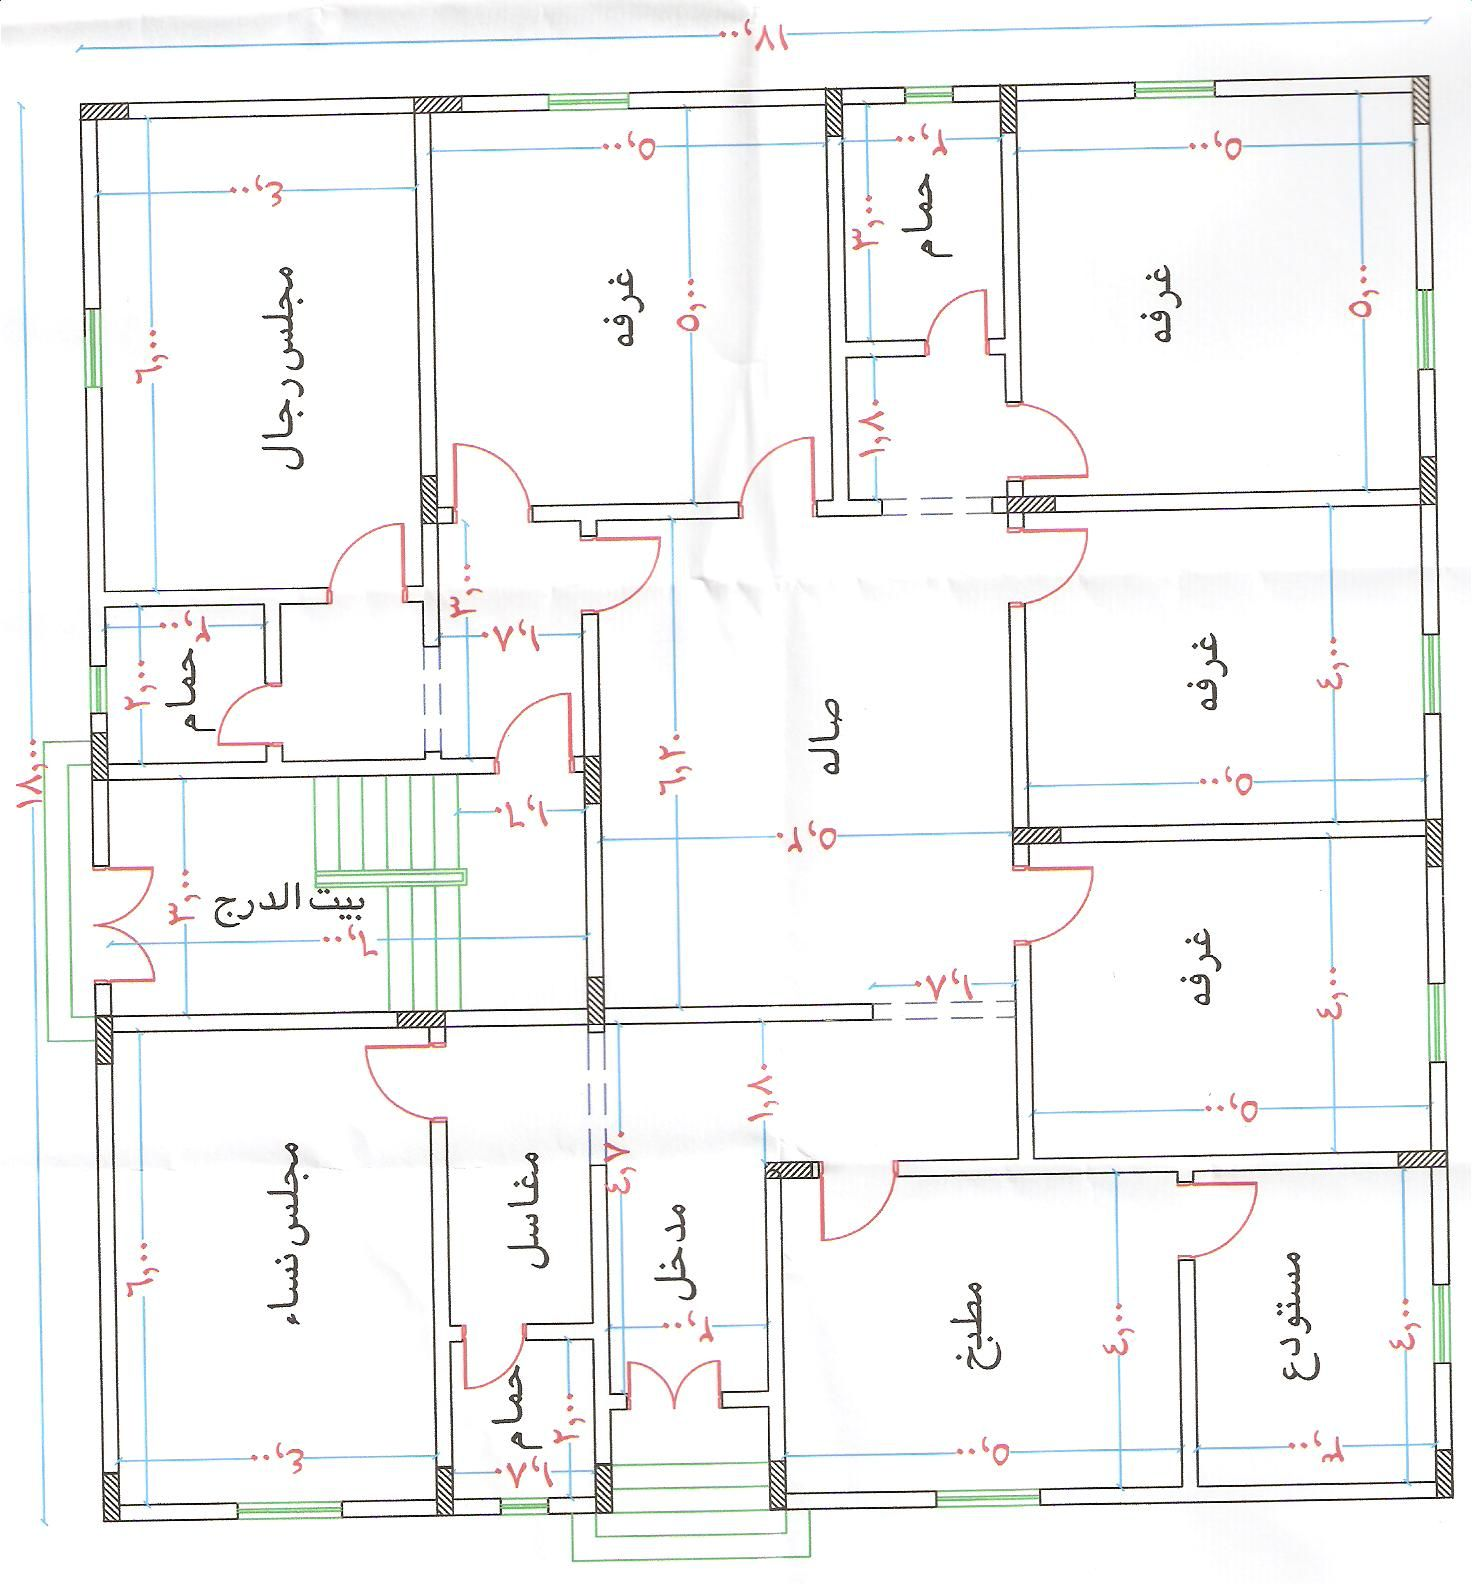 small resolution of  floor plans diagram home decor